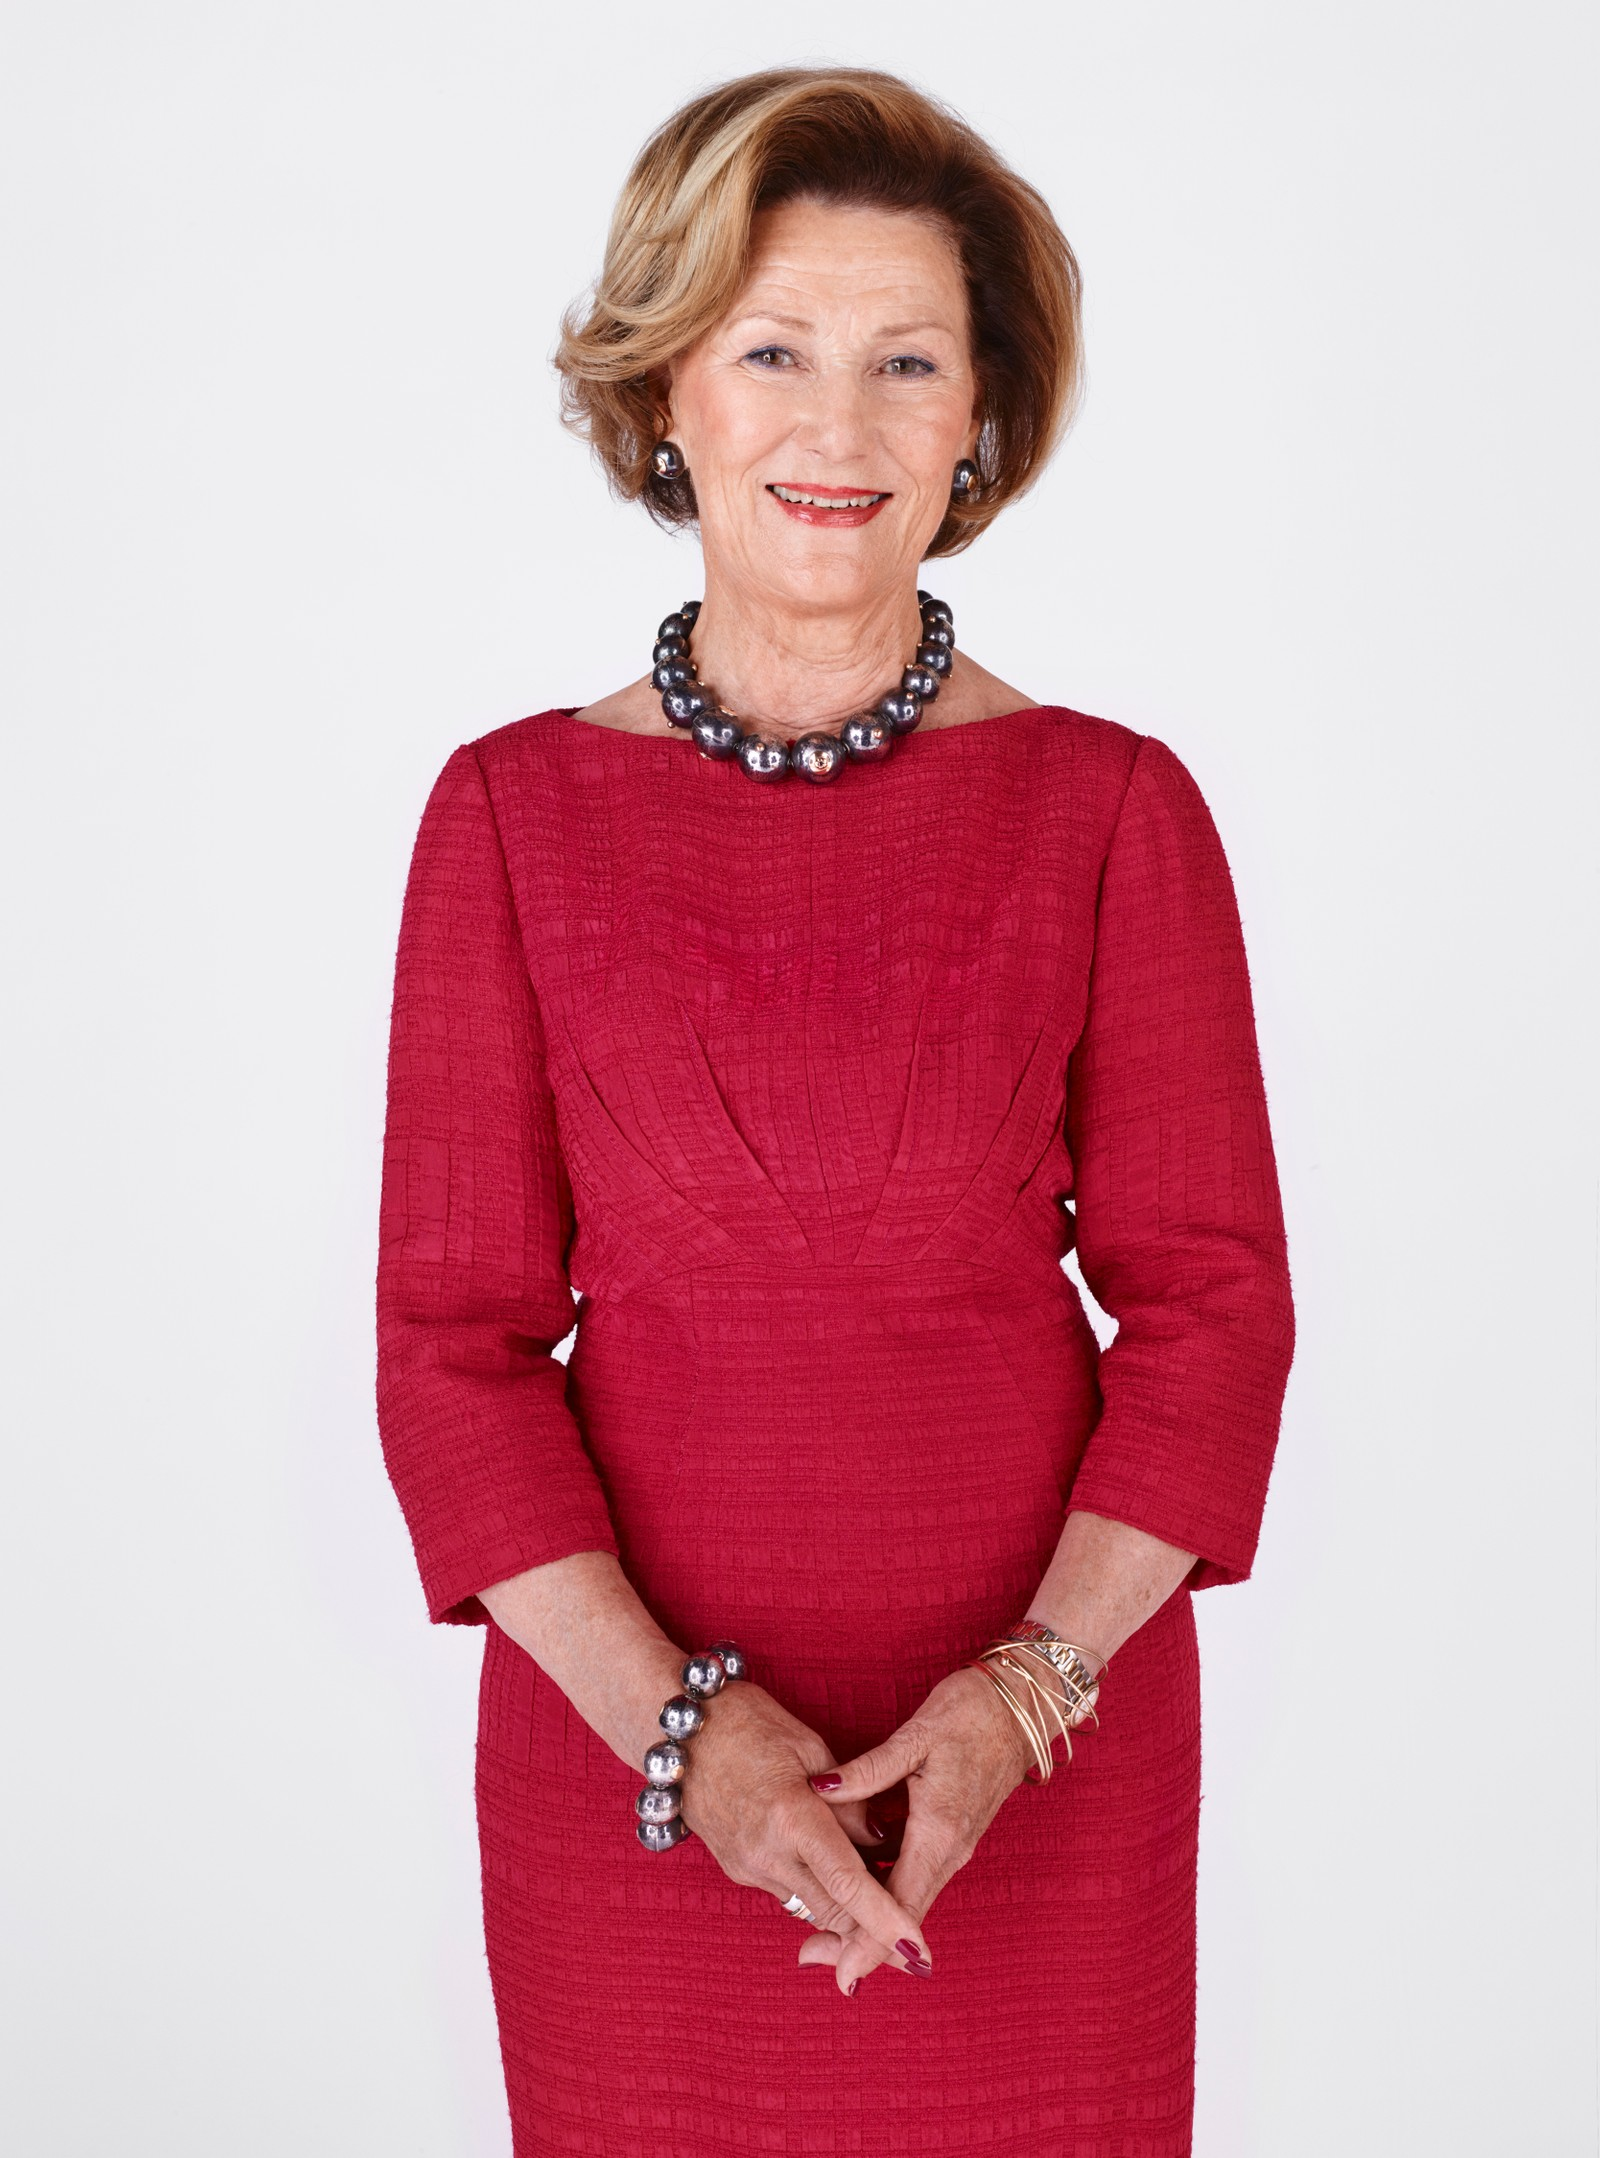 Dronning Sonja iført rød kjole.